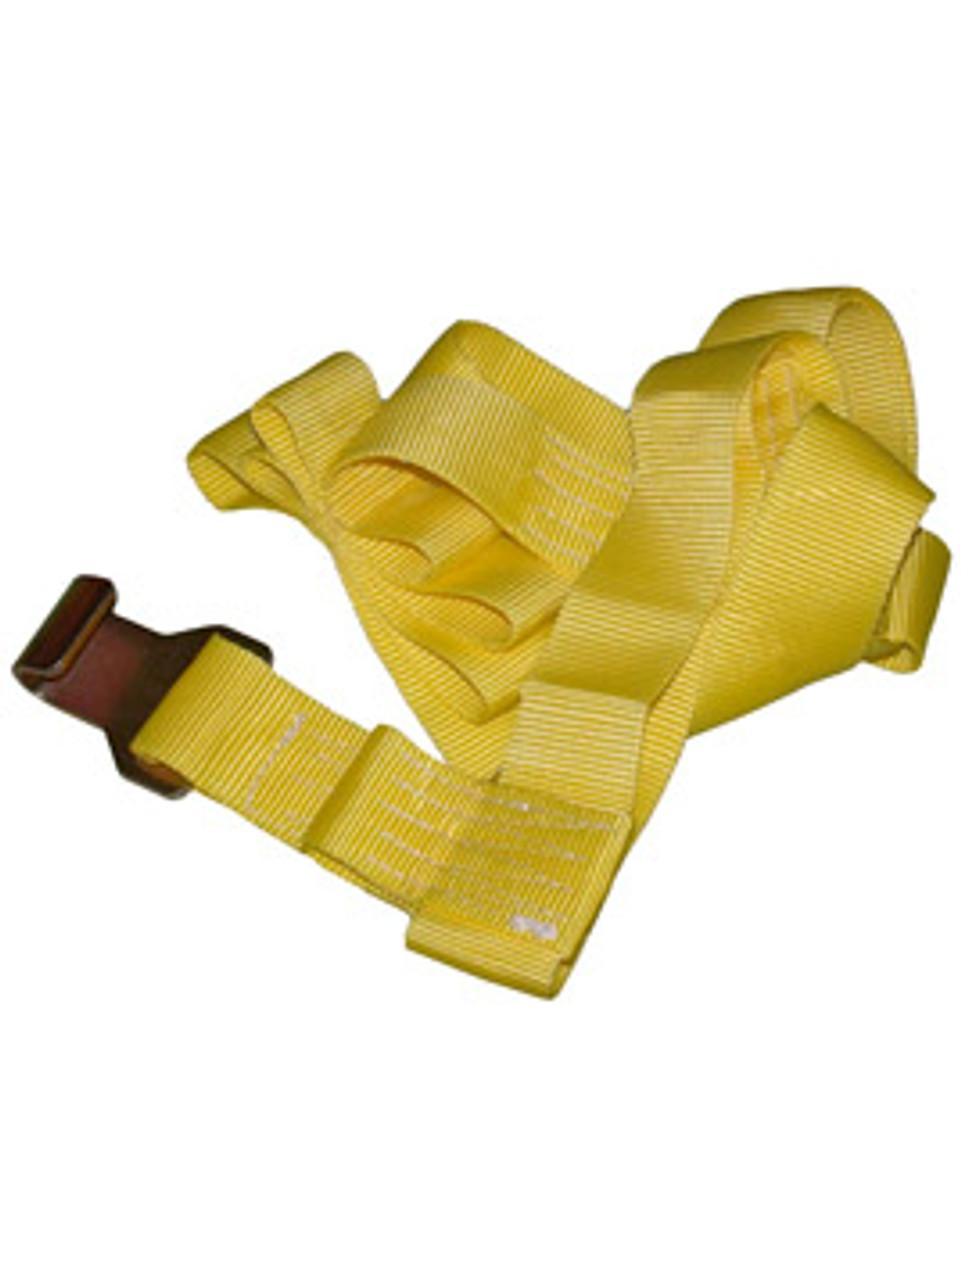 "63-0365 --- Tie Down Strap for 14"" Tire"